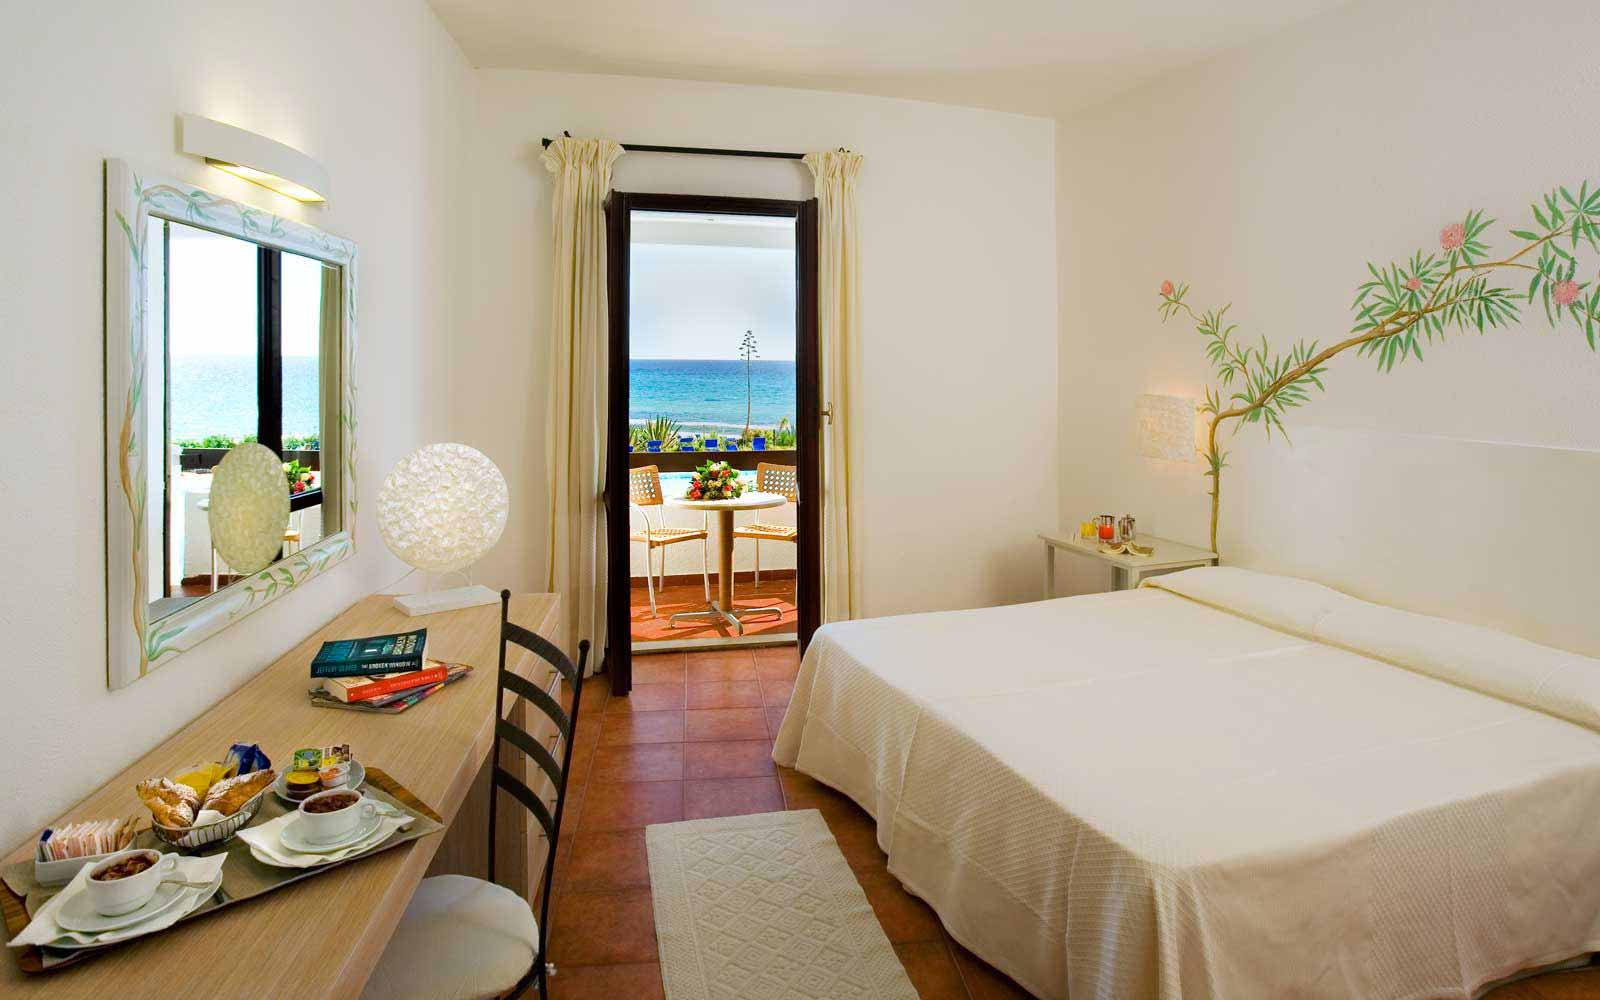 Hotel Flamingo Superior room Sea View